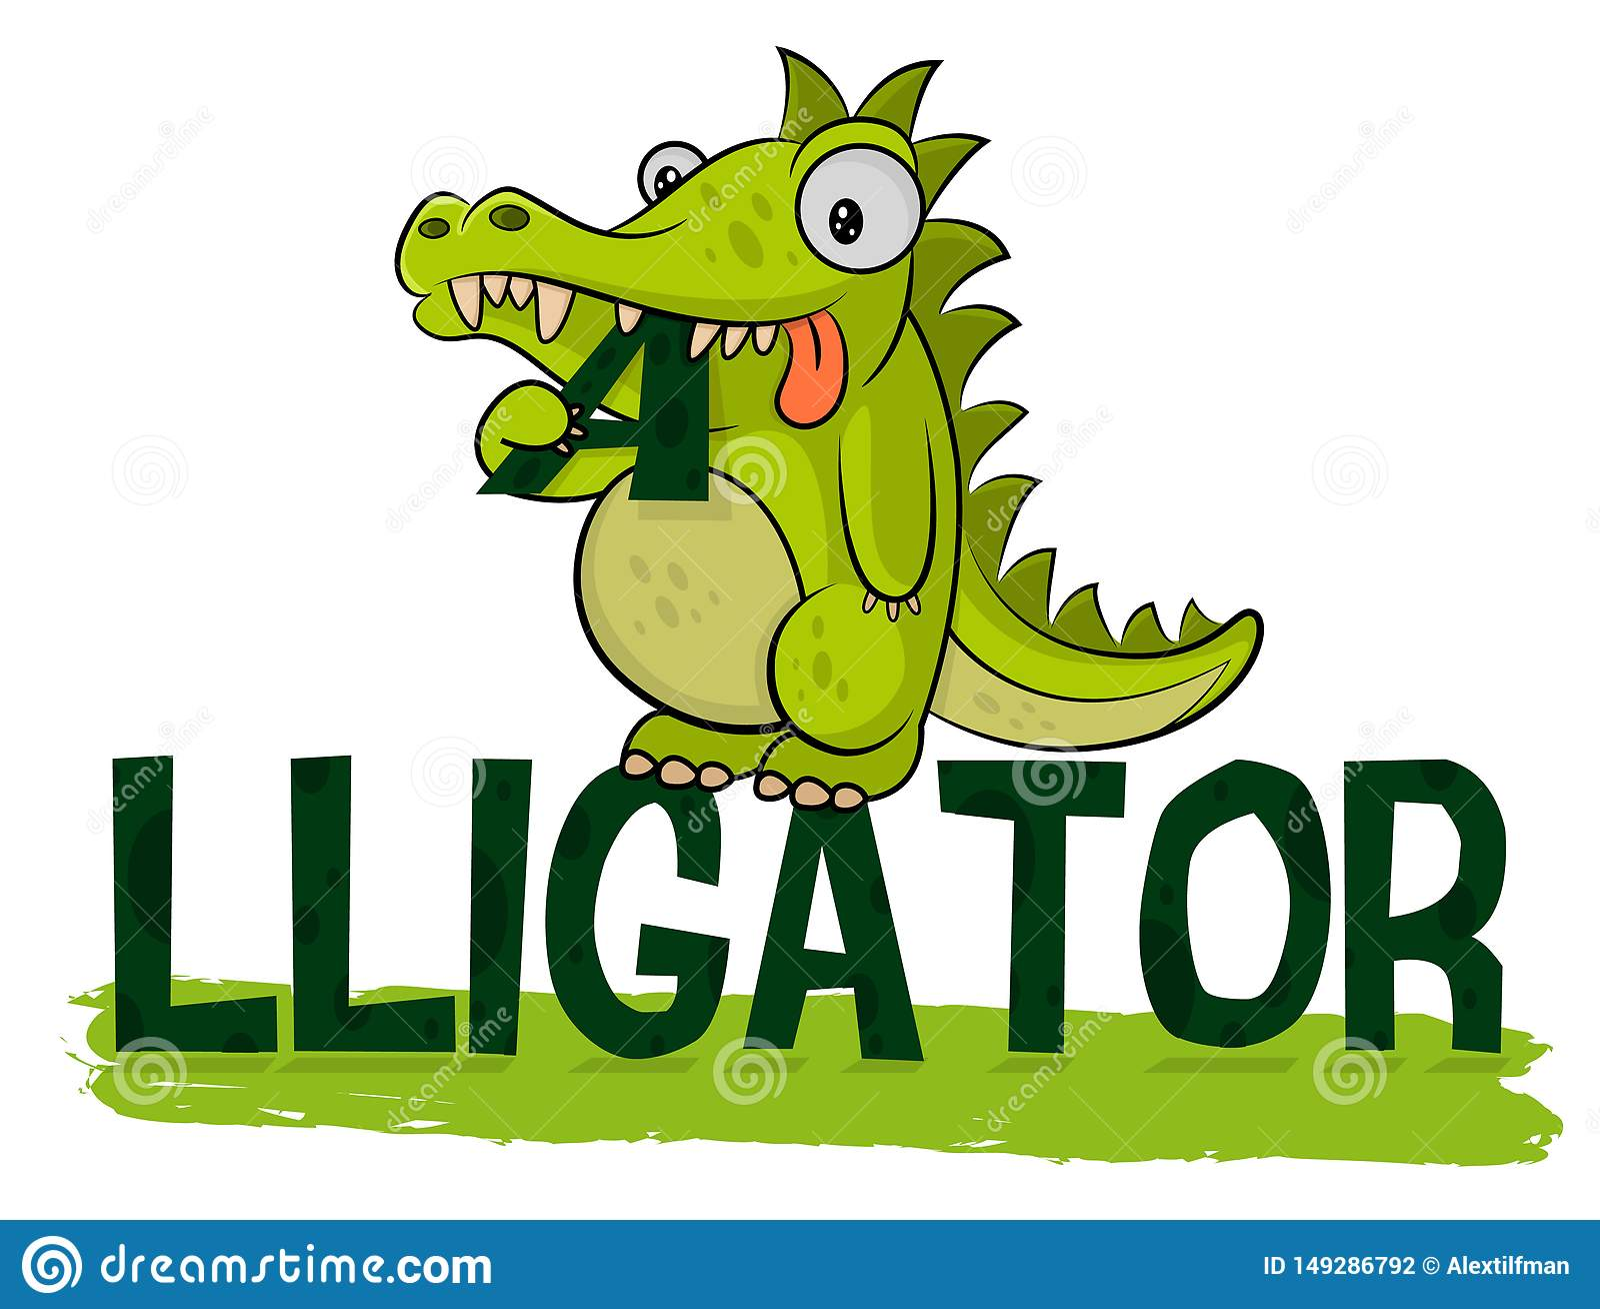 Cute hungry alligator eats logo. Crocodile Logotype Vector. Alligator illustration. Fat little croc. Friendly animal from the zoo.